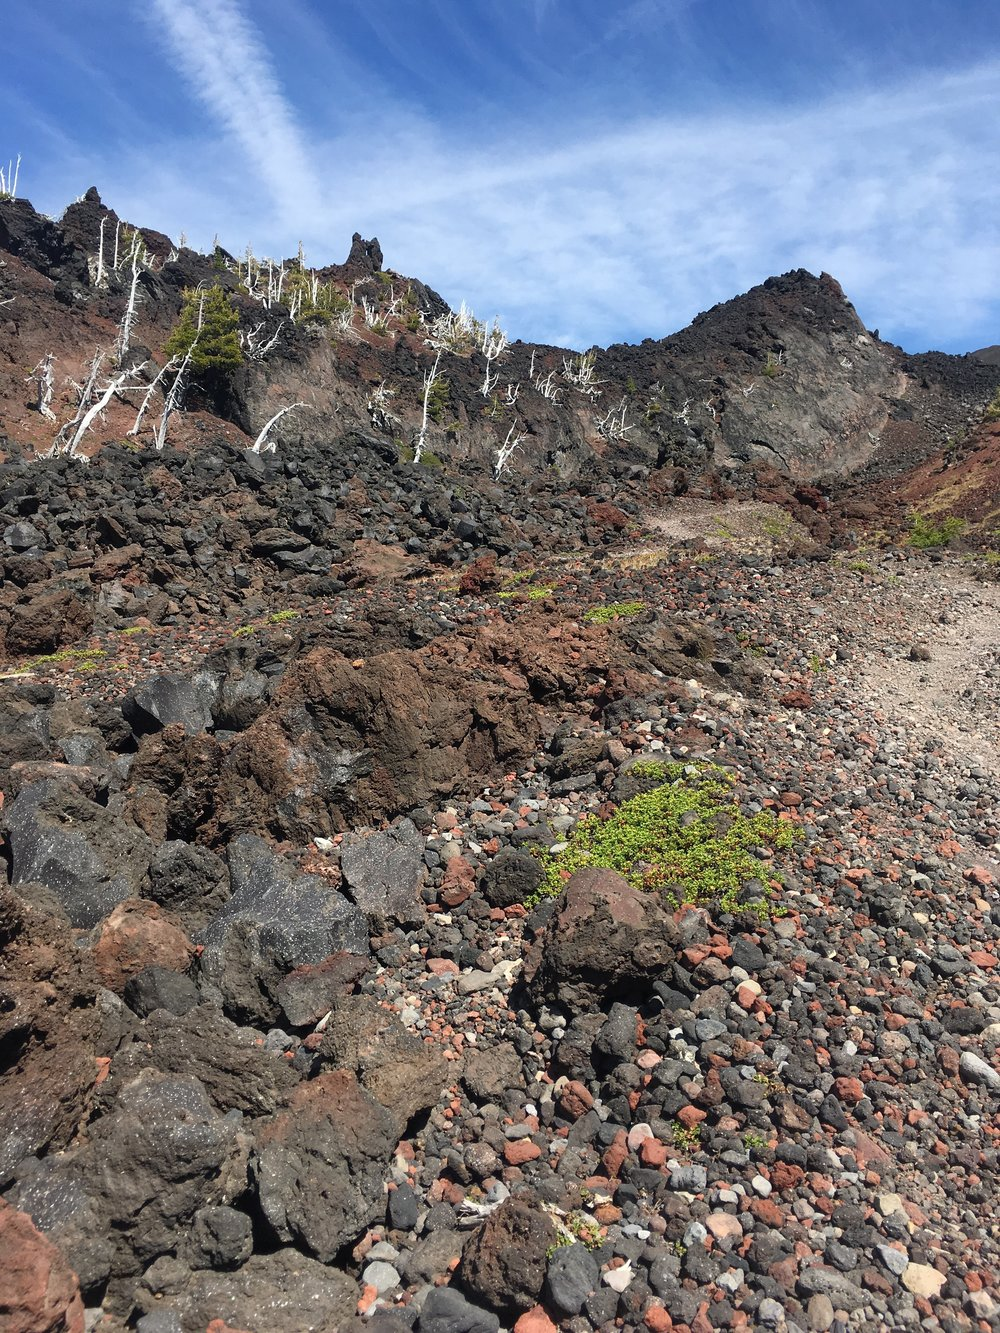 Lava, lava everywhere